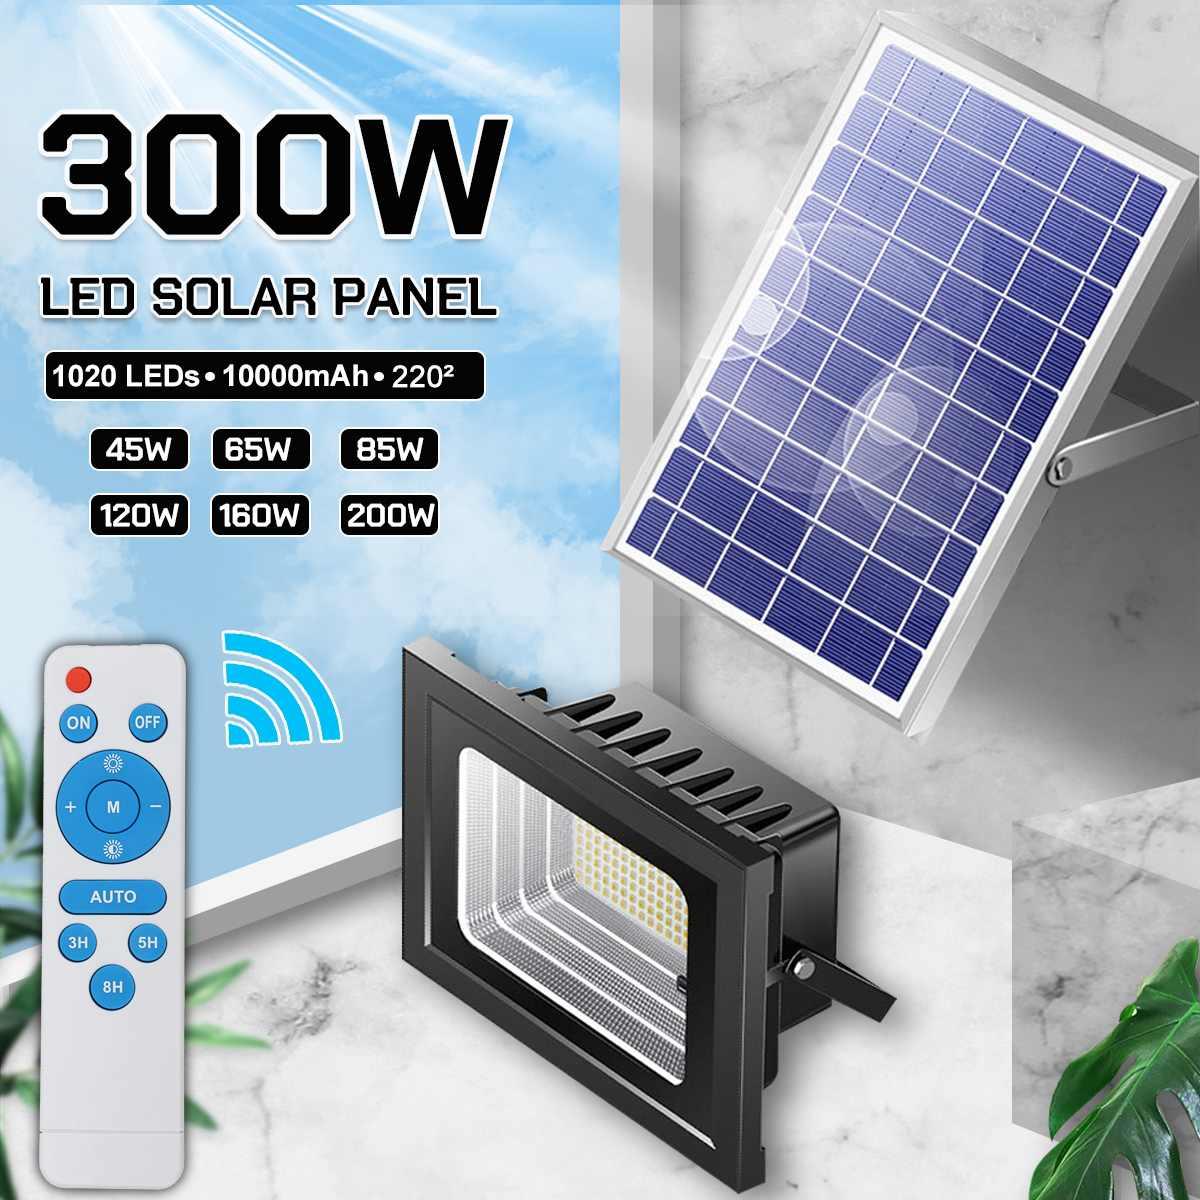 300/200/150/120W LED Flood Light Solar Street Lights Household Waterproof Remote Indoor and Outdoor Lighting Garden Wall Lamp